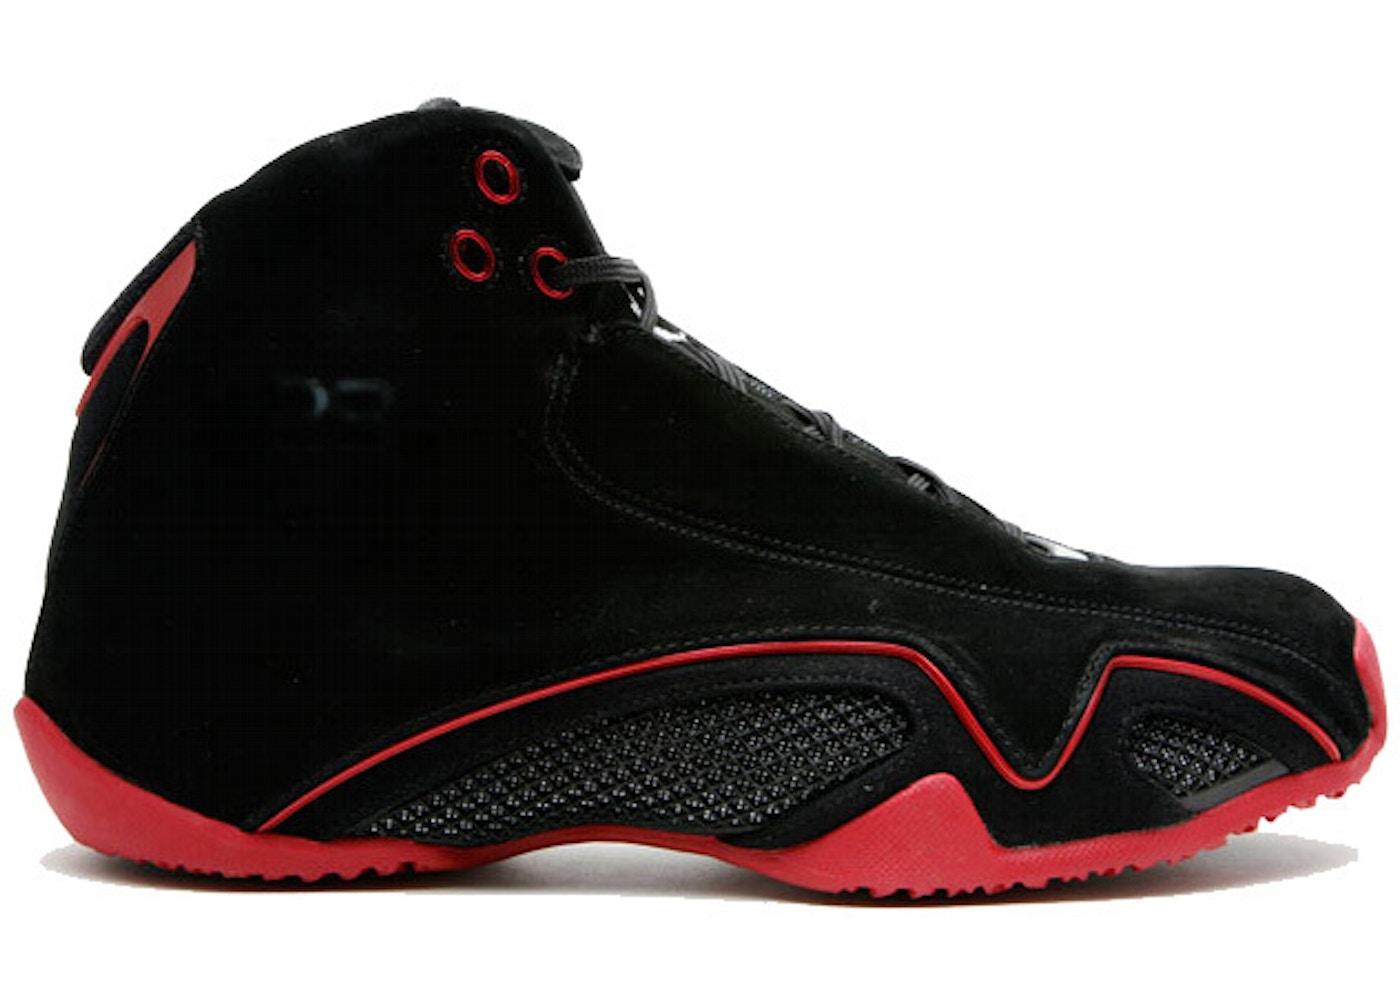 Jordan 21 Retro Bred CDP (2008) - 322717-061 306969dc9097